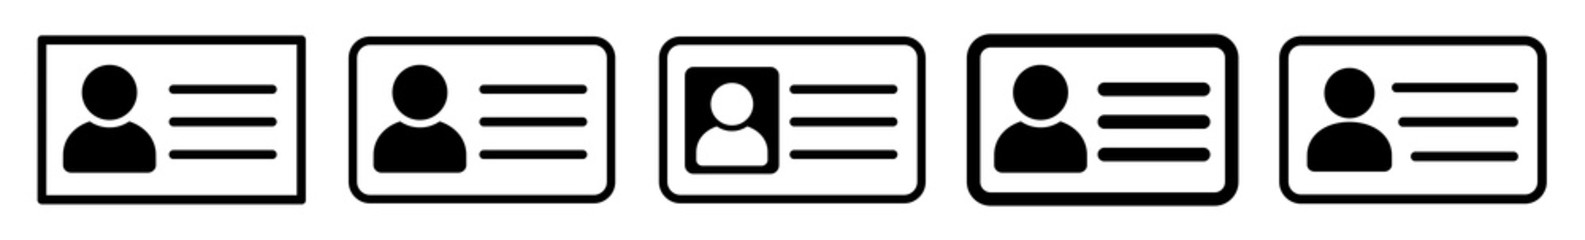 ID Card Icon Black | Driver's License Illustration | ID Badge Symbol | Identity Logo | Pass Passport Sign | Isolated | Variations